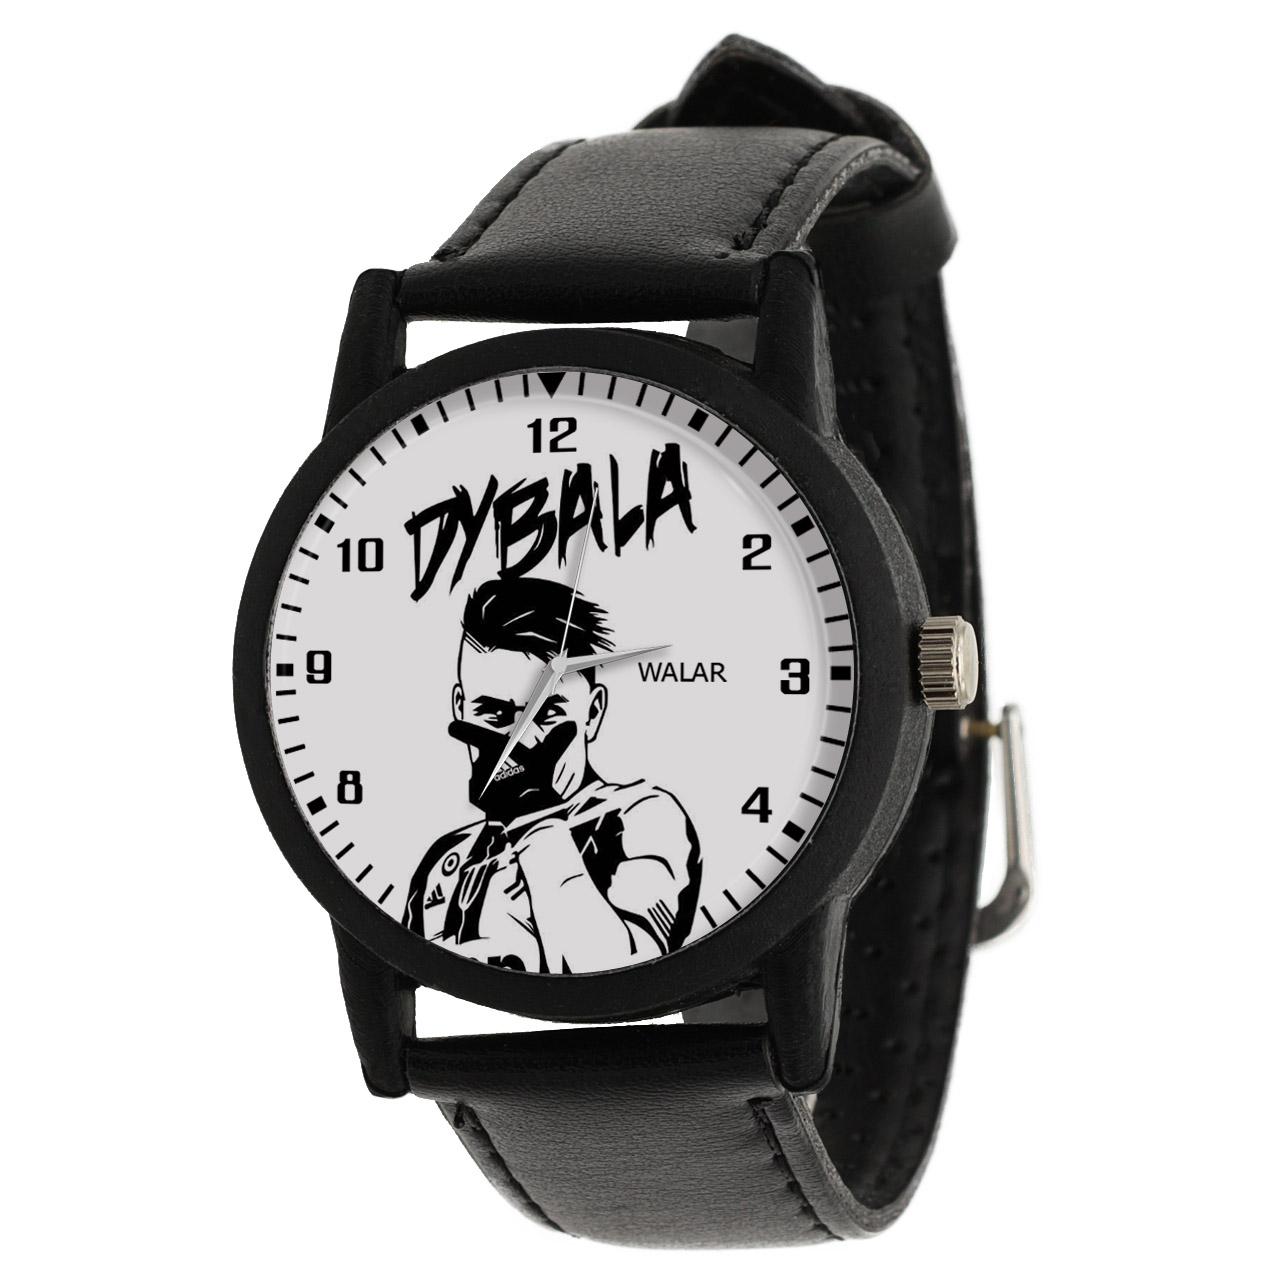 ساعت مچی عقربه ای مردانه والار طرح پائولو دیبالا کد LF2119